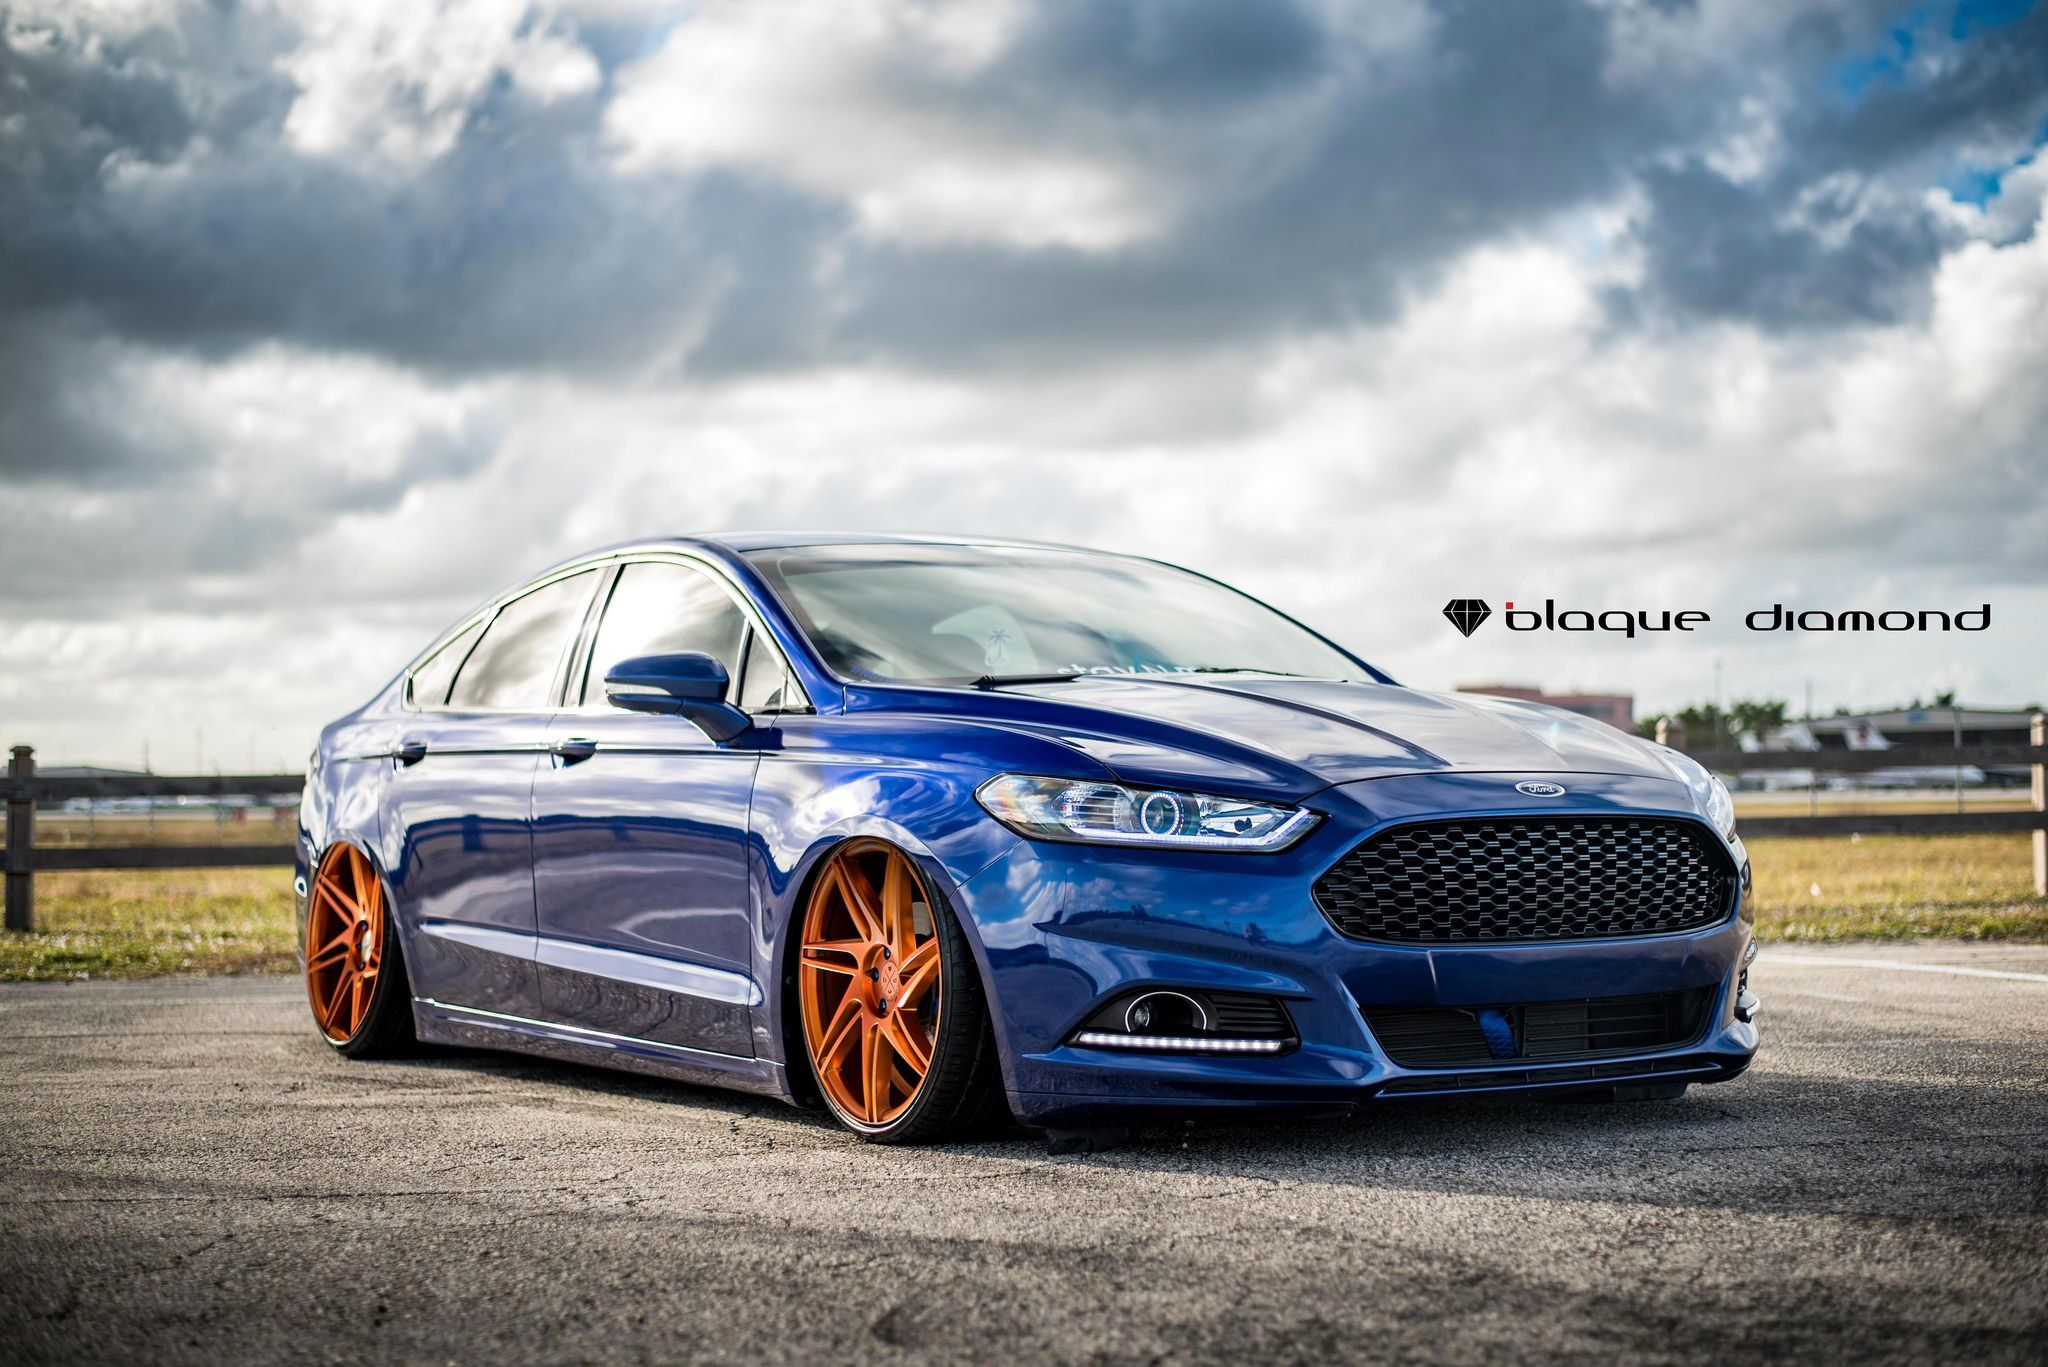 Slammed Ford Fusion On Insane Rims By Black Diamond Ford Fusion Ford 2013 Ford Fusion